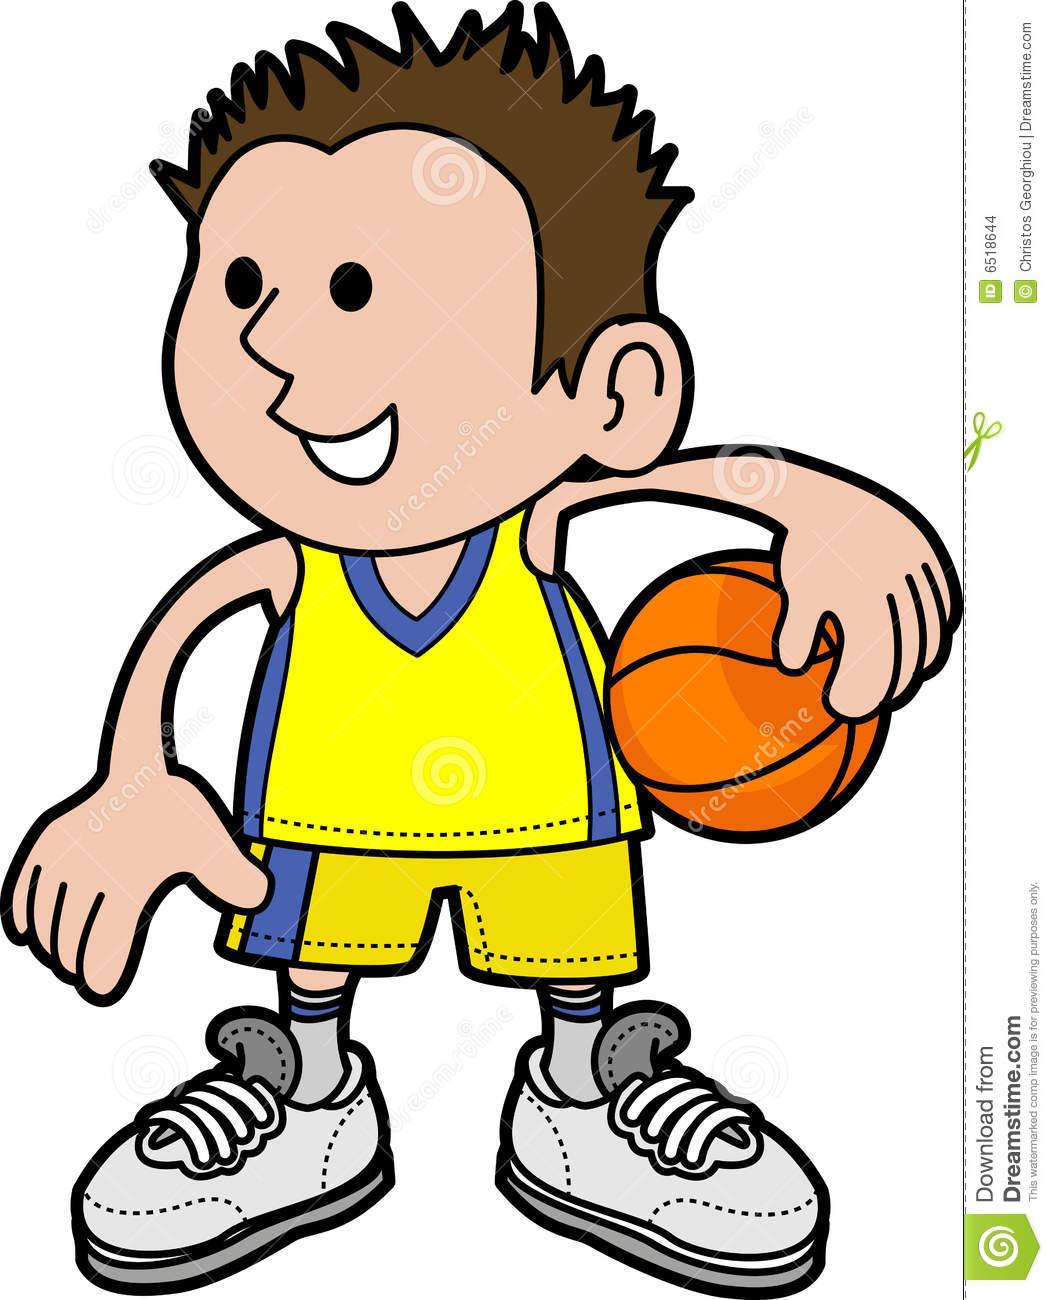 Boys clipart basketball player. Kid panda free images